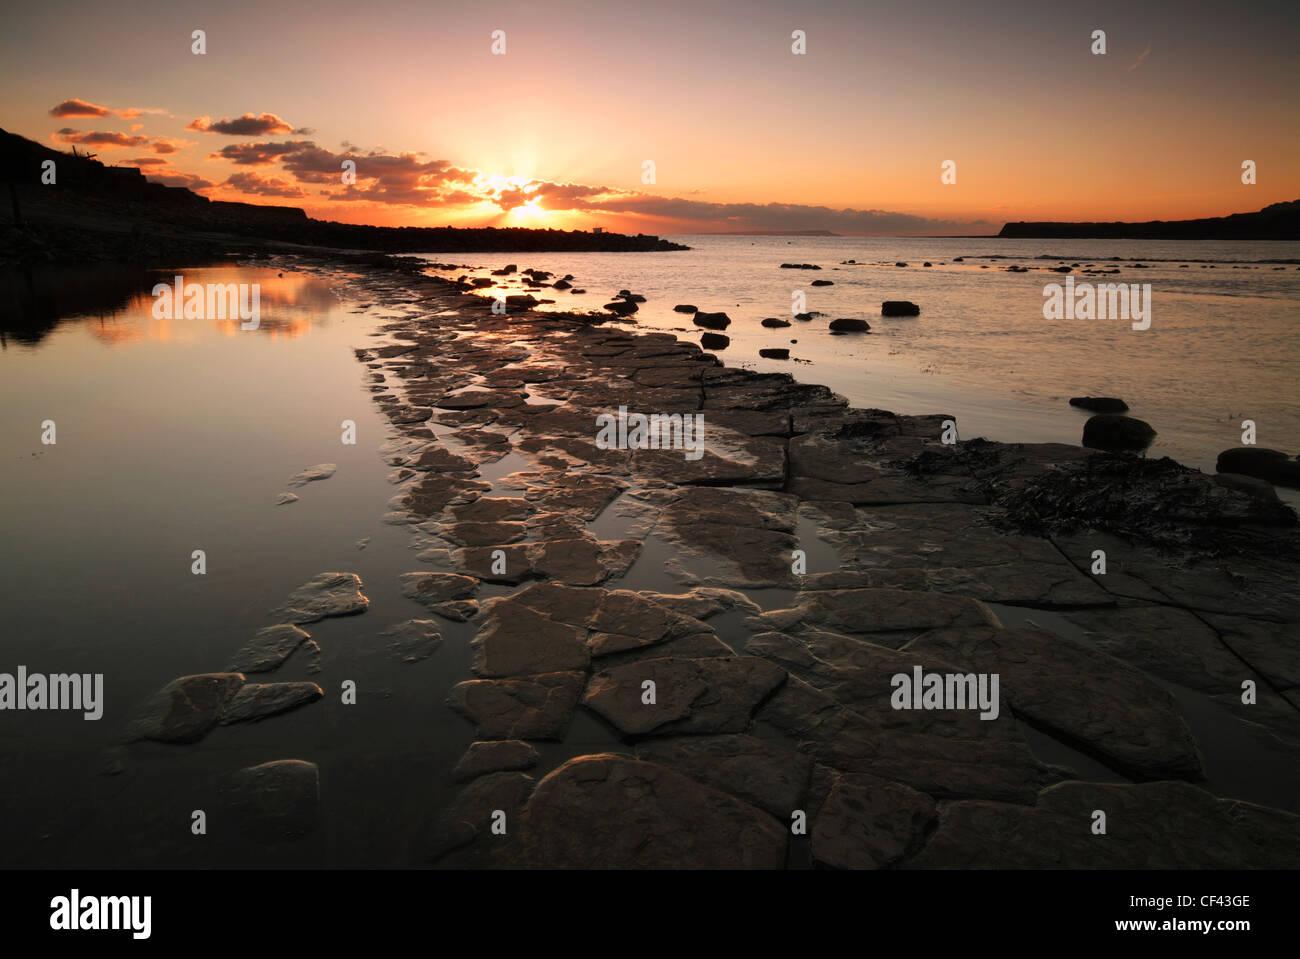 Vivid sunset over the Jurassic Coast at Kimmeridge Bay lighting up the jigsaw shaped prehistoric rock beds. - Stock Image